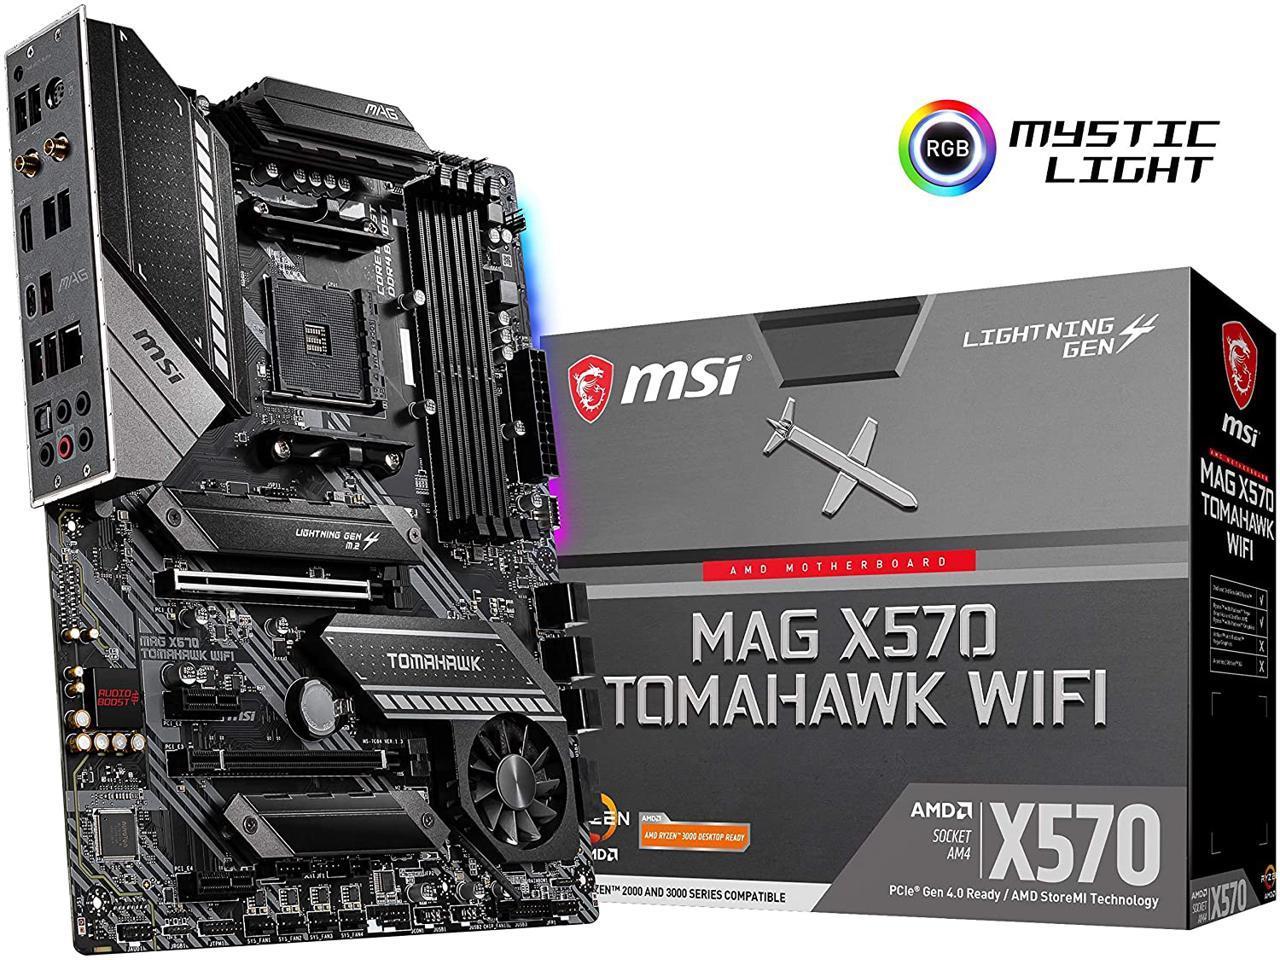 MSI MAG X570 TOMAHAWK WIFI AM4 AMD X570 at newegg - free shipping $219.99